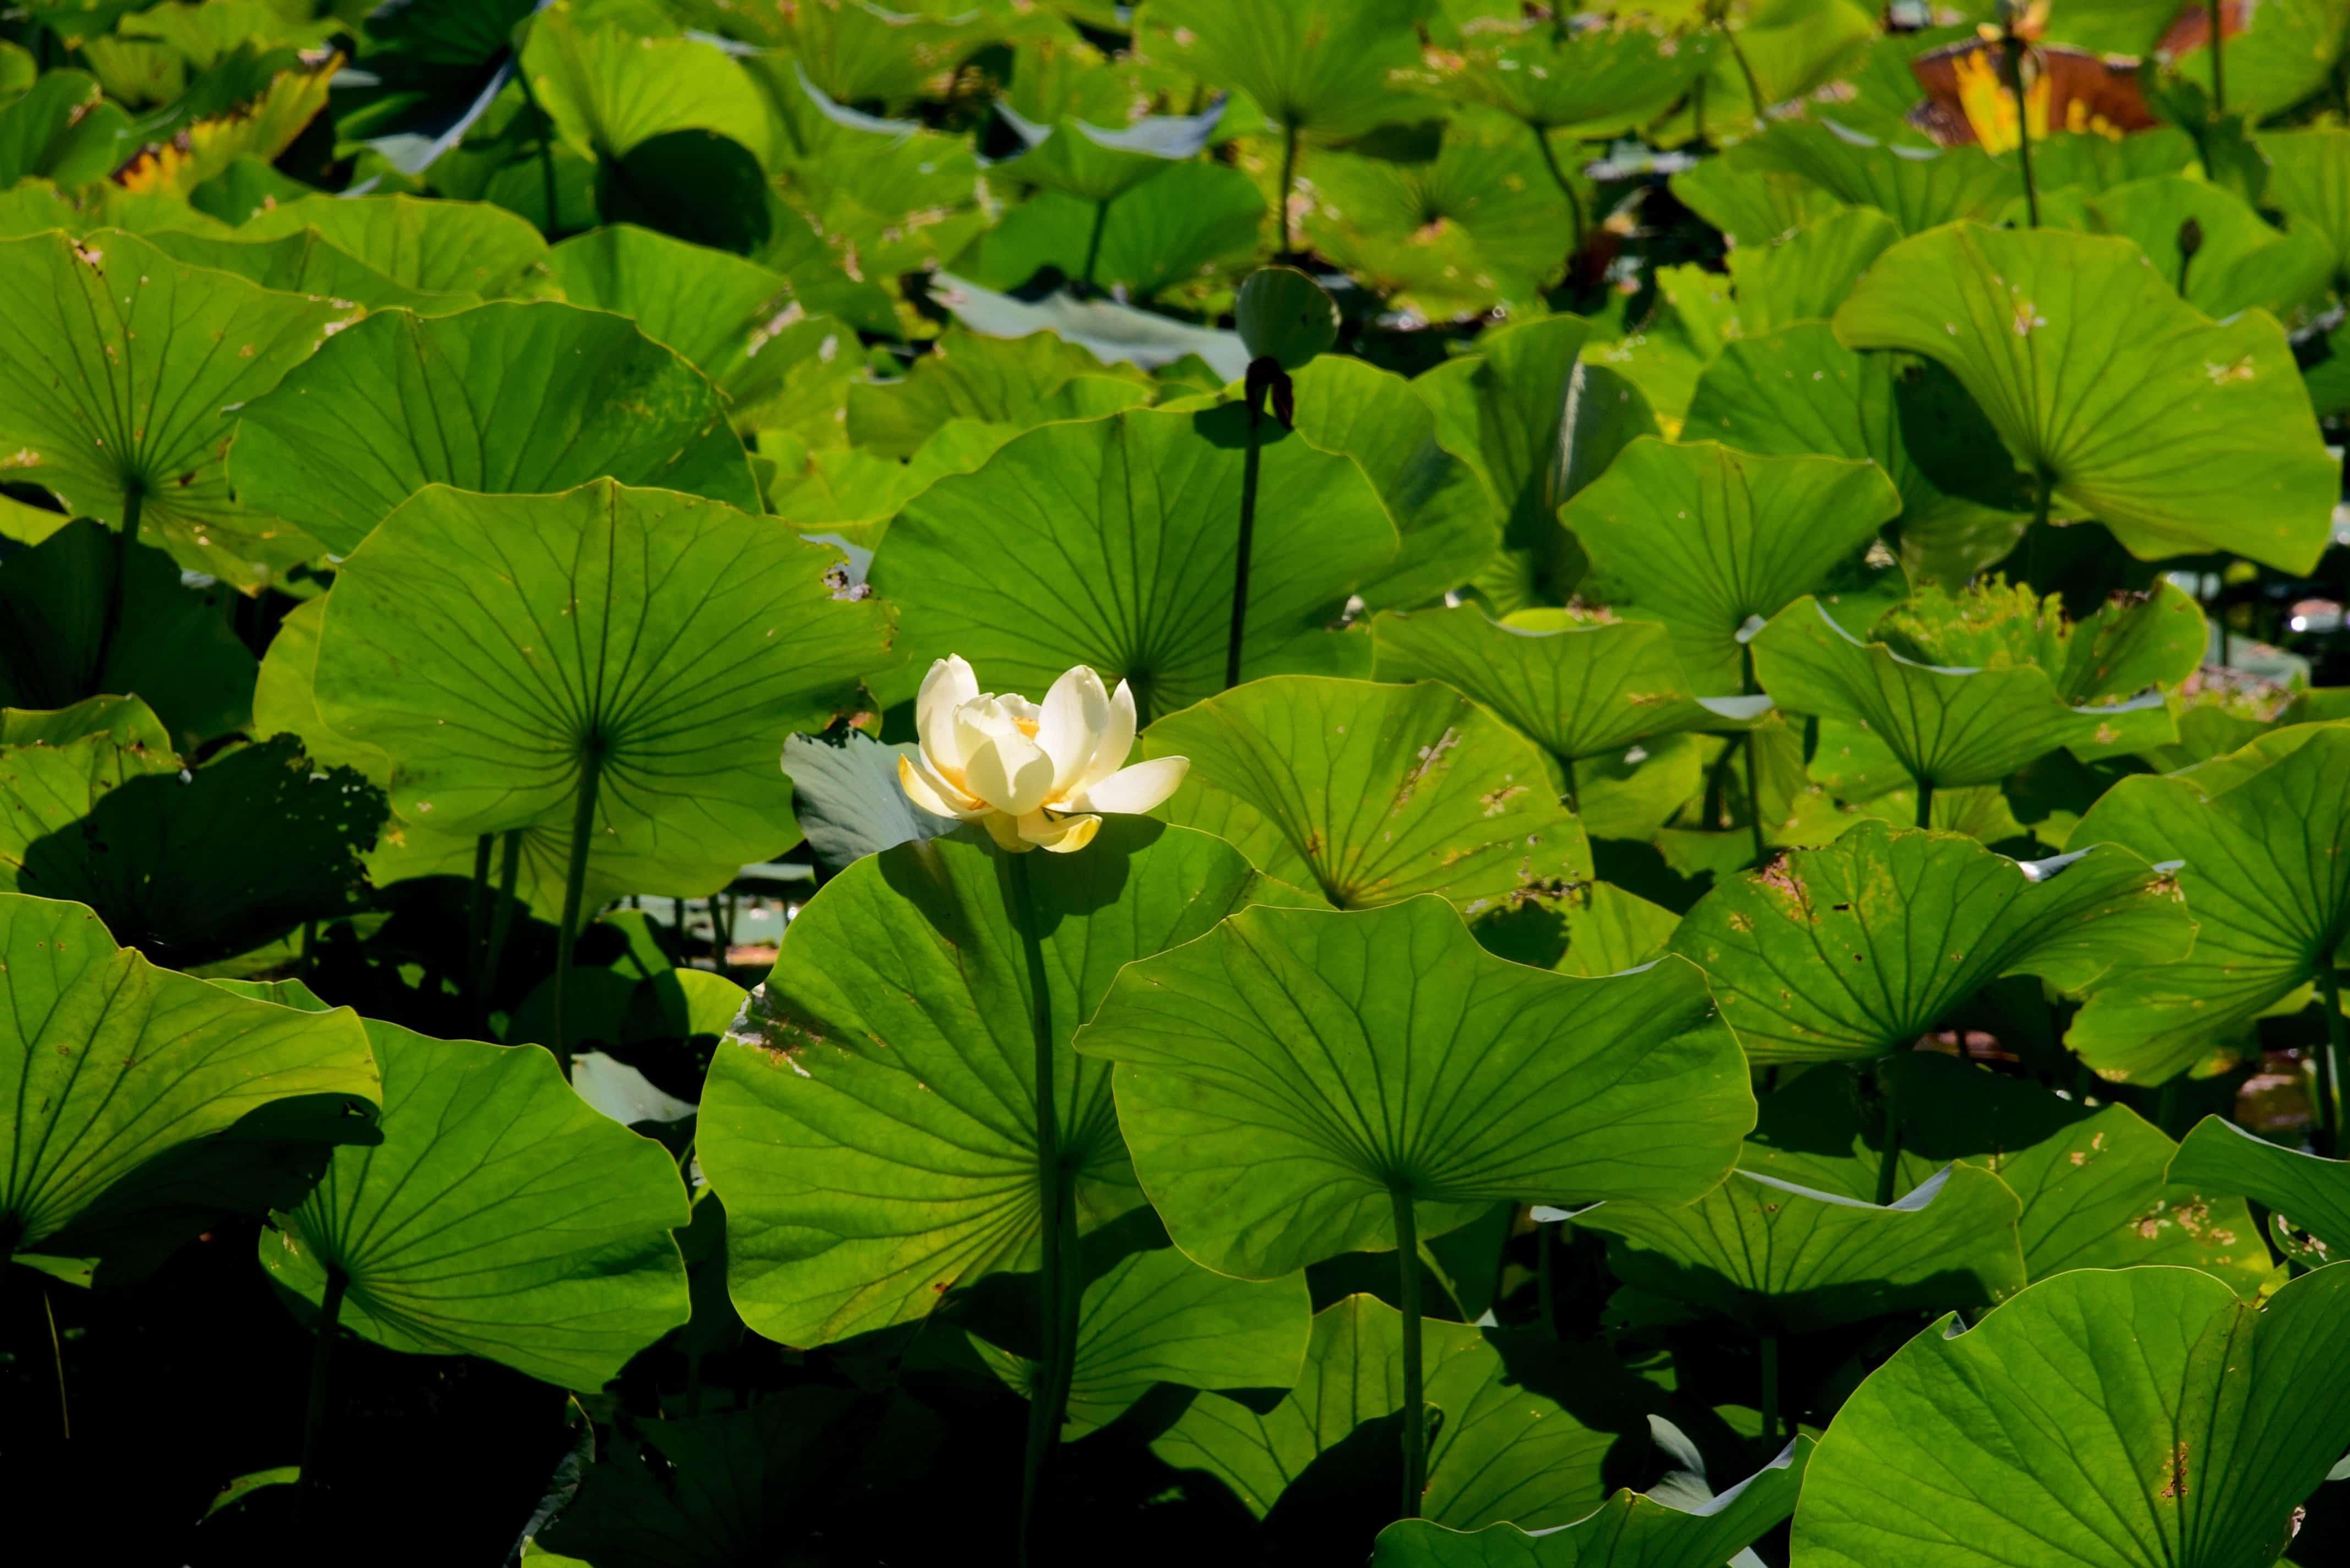 Imagen Gratis Flora Ex Tico Hoja De Nen Far Jard N Naturaleza  # Muebles Nenufar